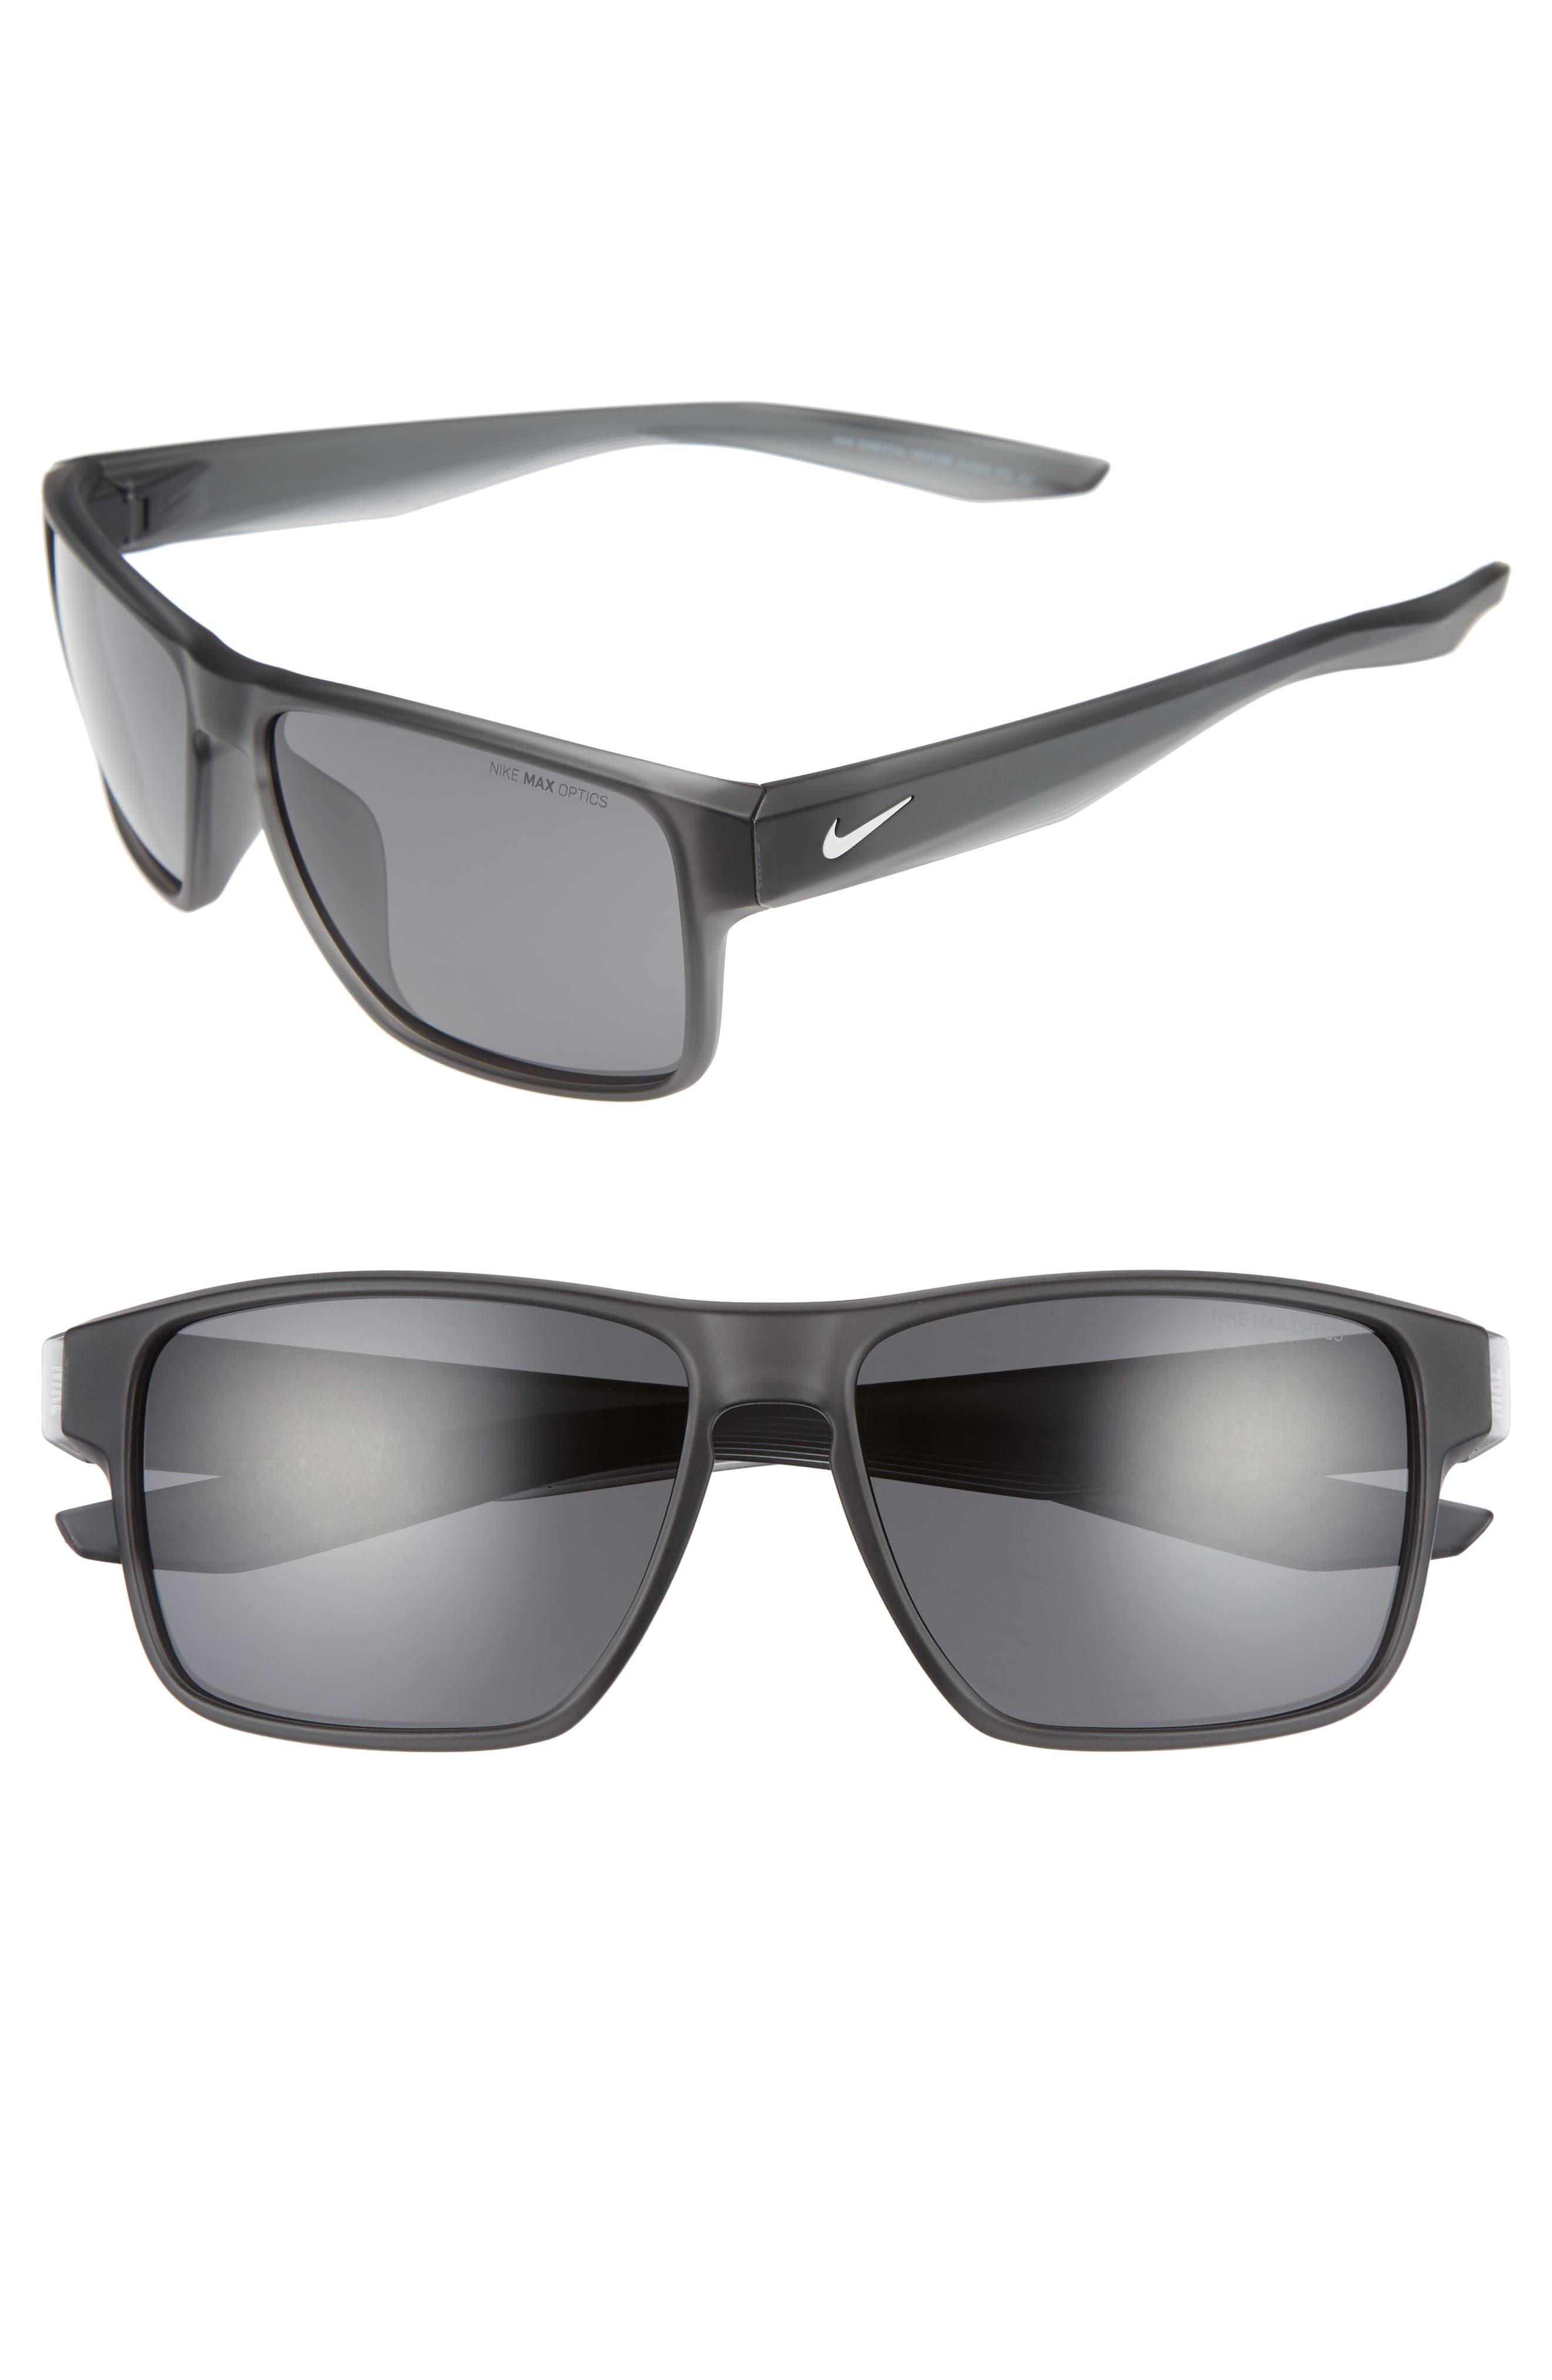 Essential Venture 59mm Sunglasses,                             Main thumbnail 1, color,                             MATTE ANTHRACITE